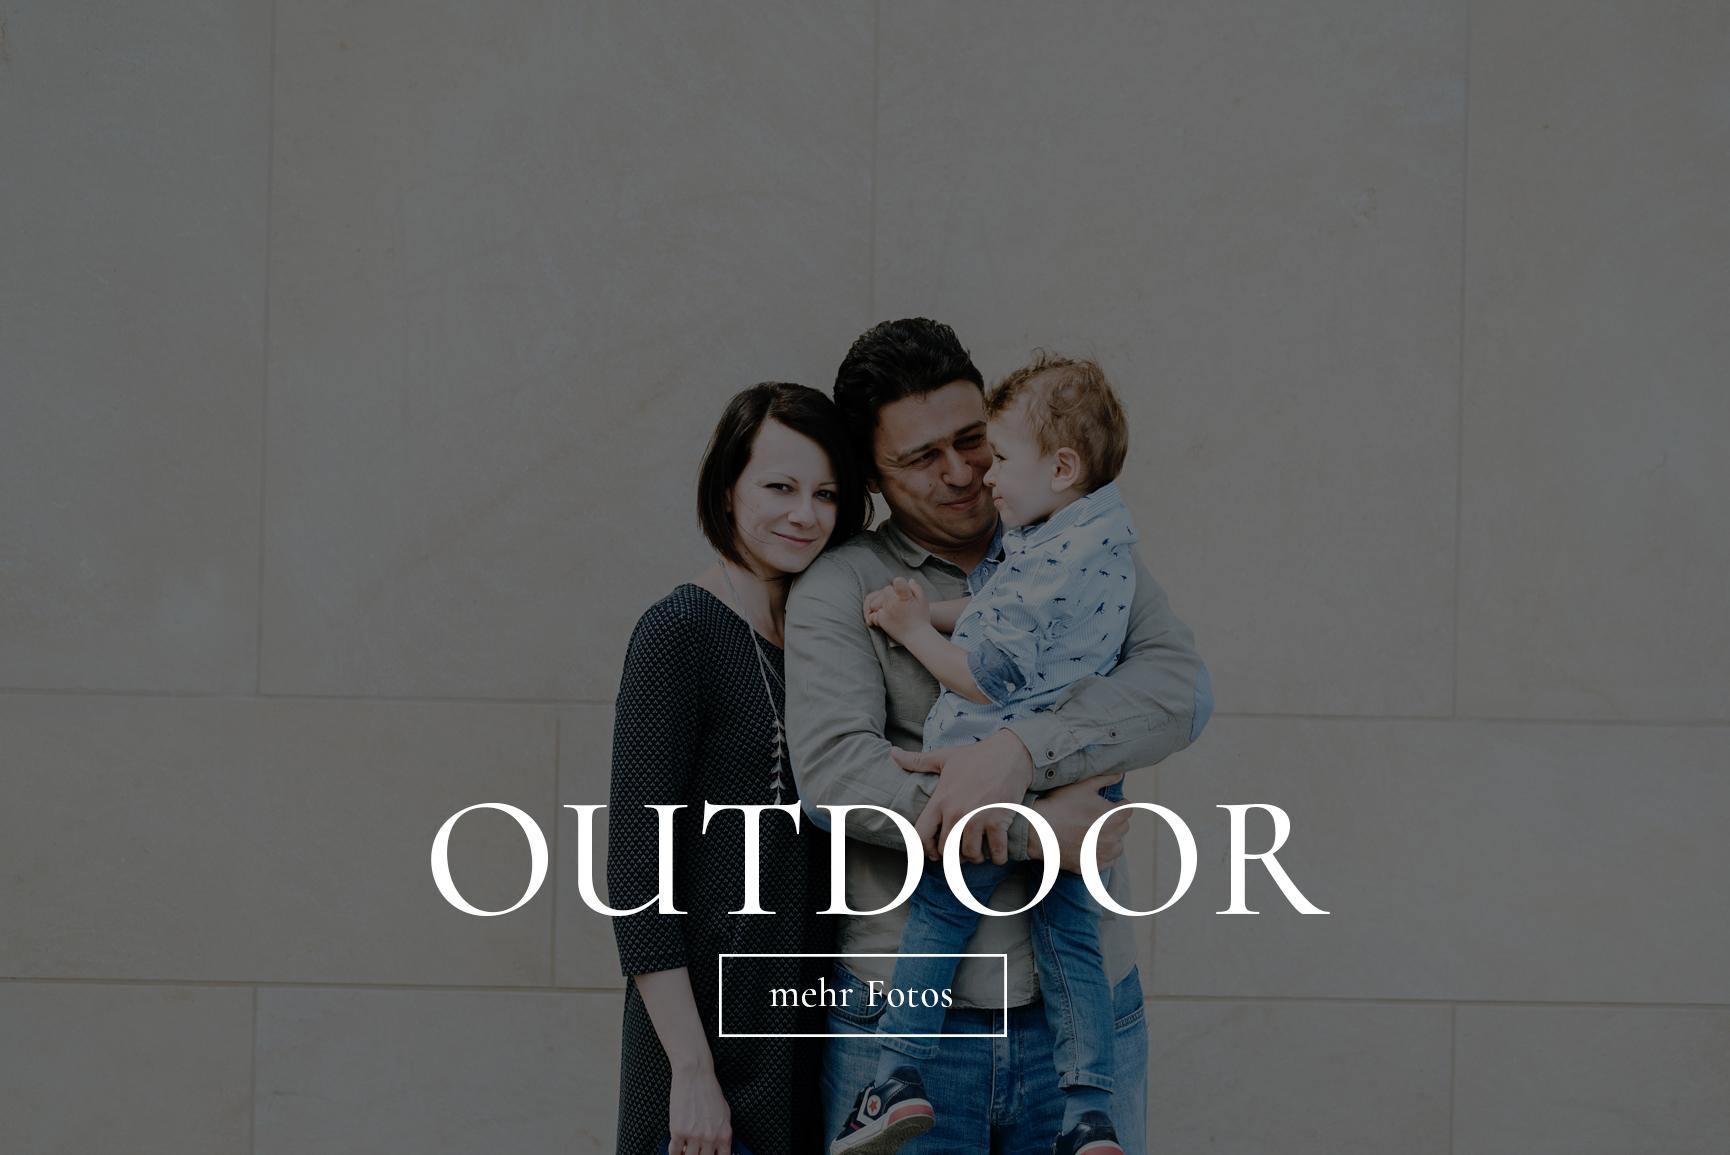 Outddor 2.jpg